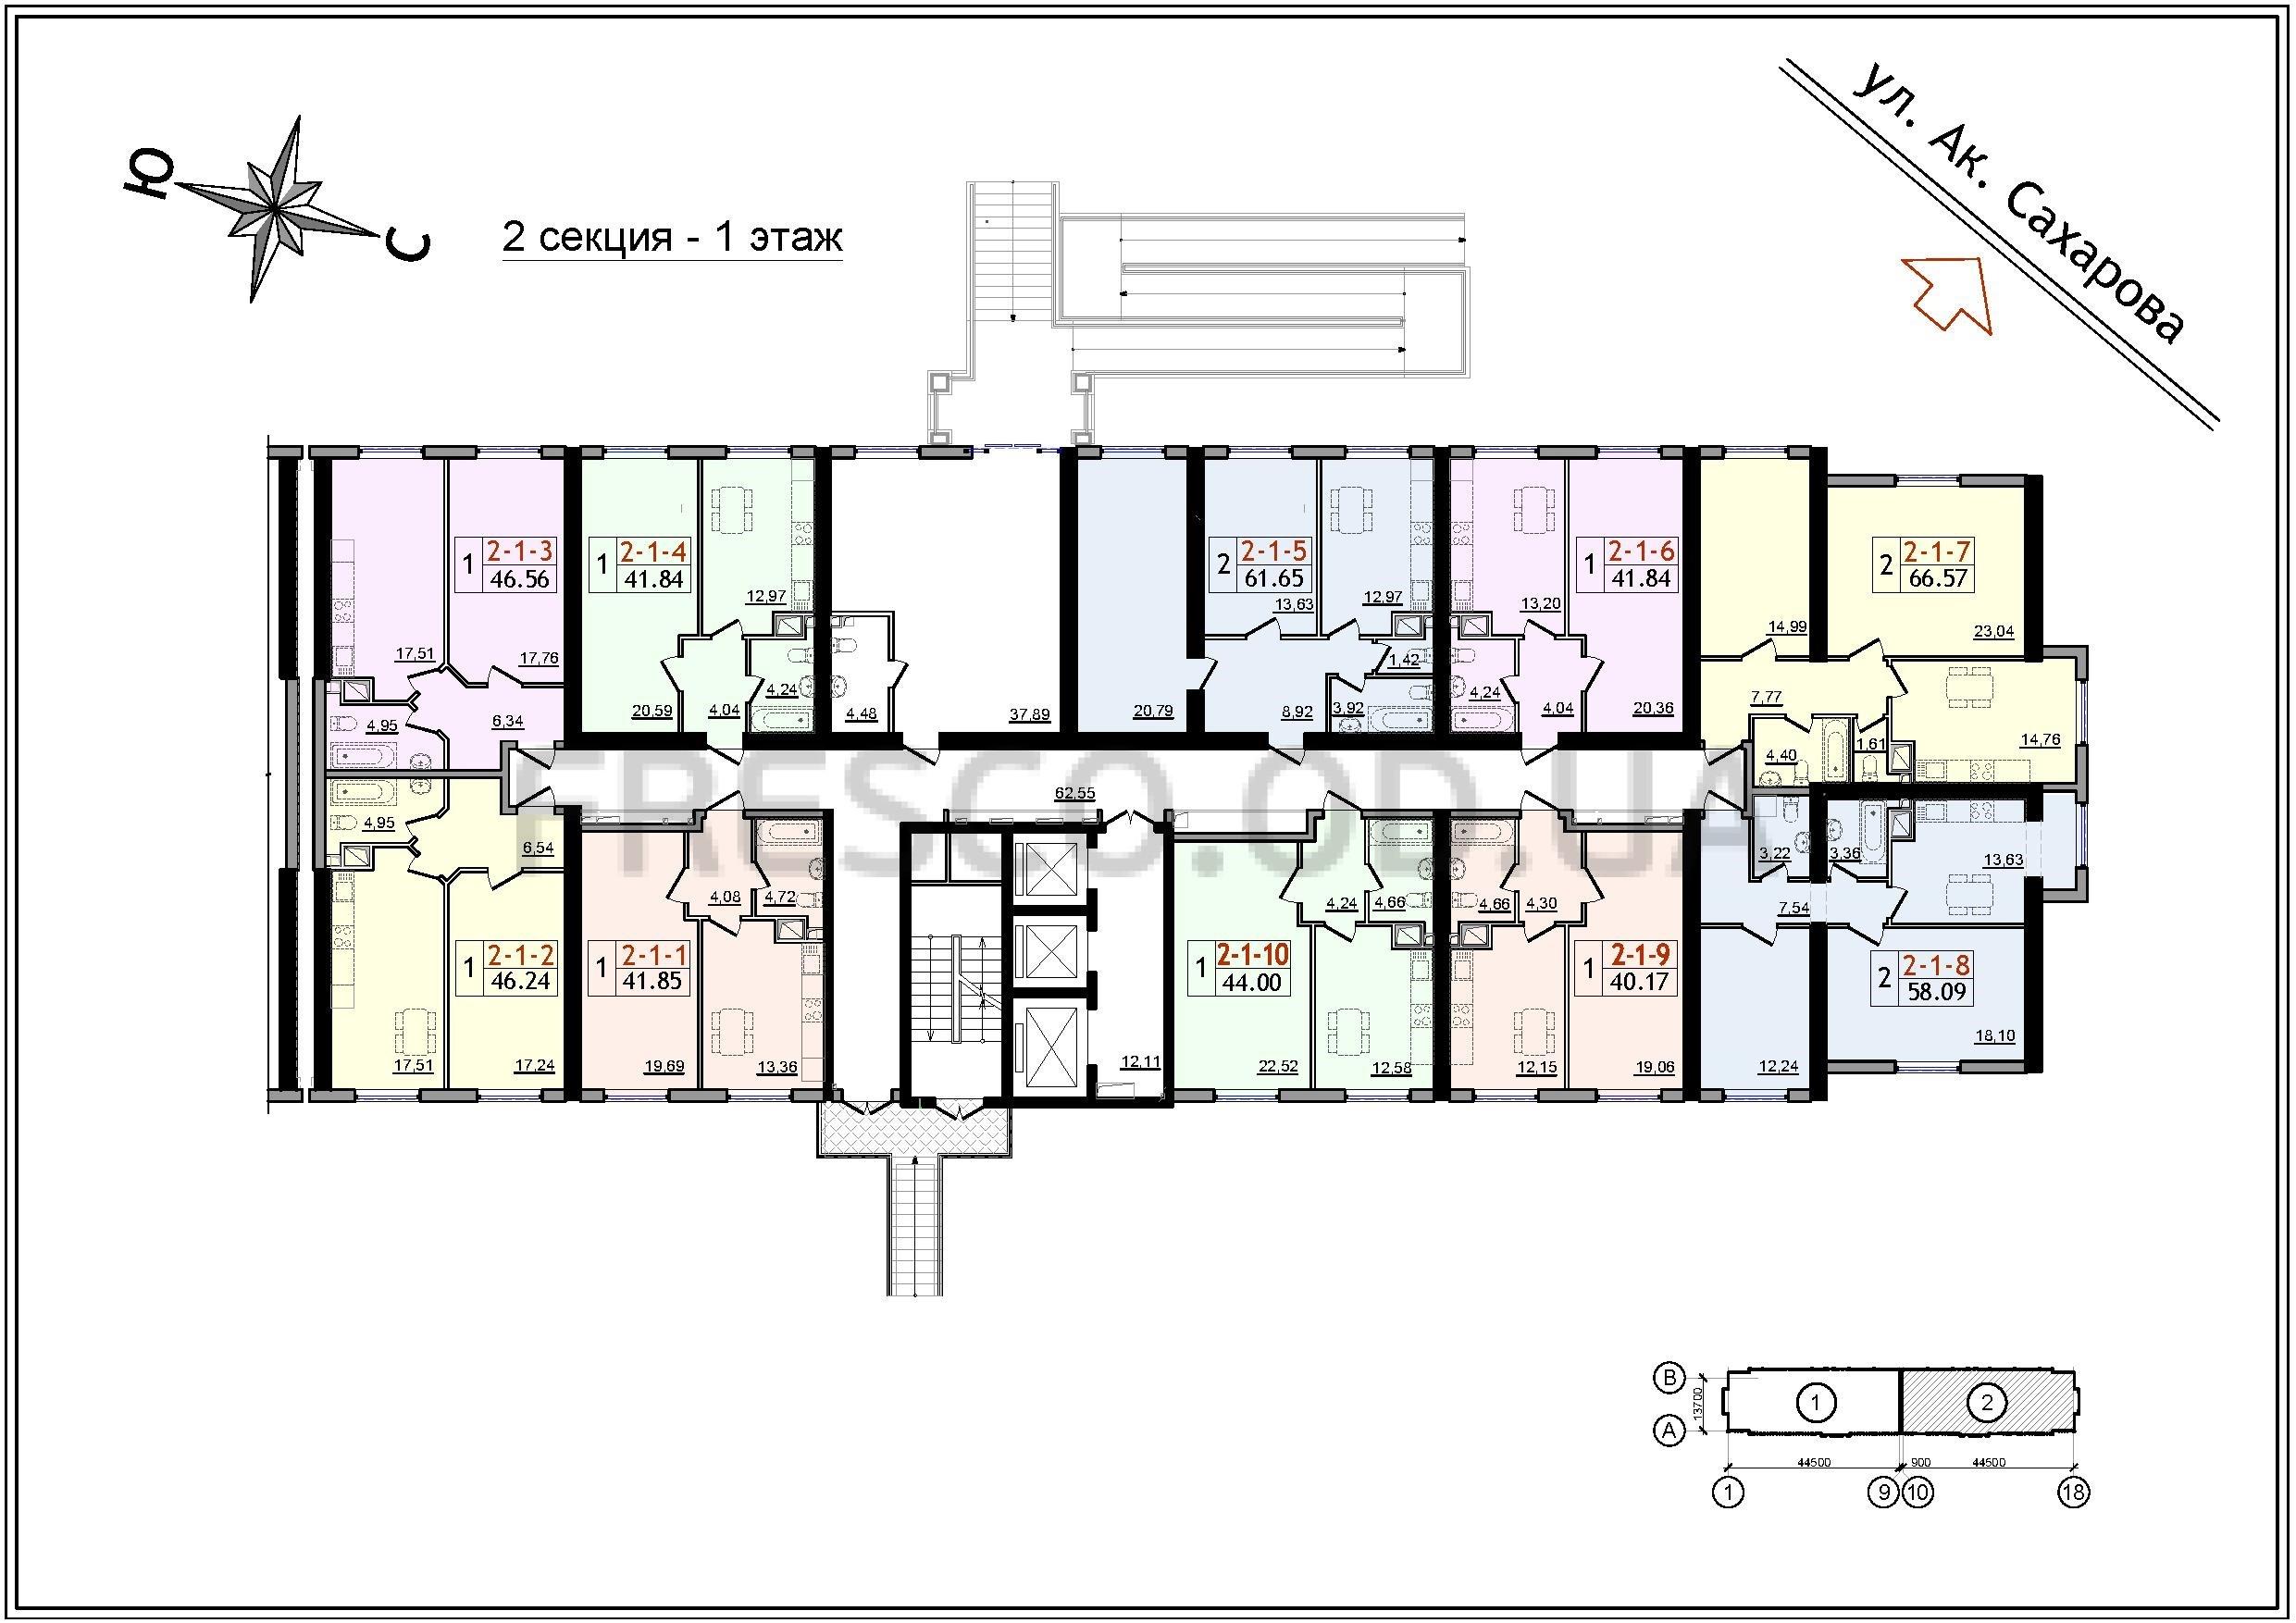 ЖК 54 Жемчужина 2 секция план 1 этажа